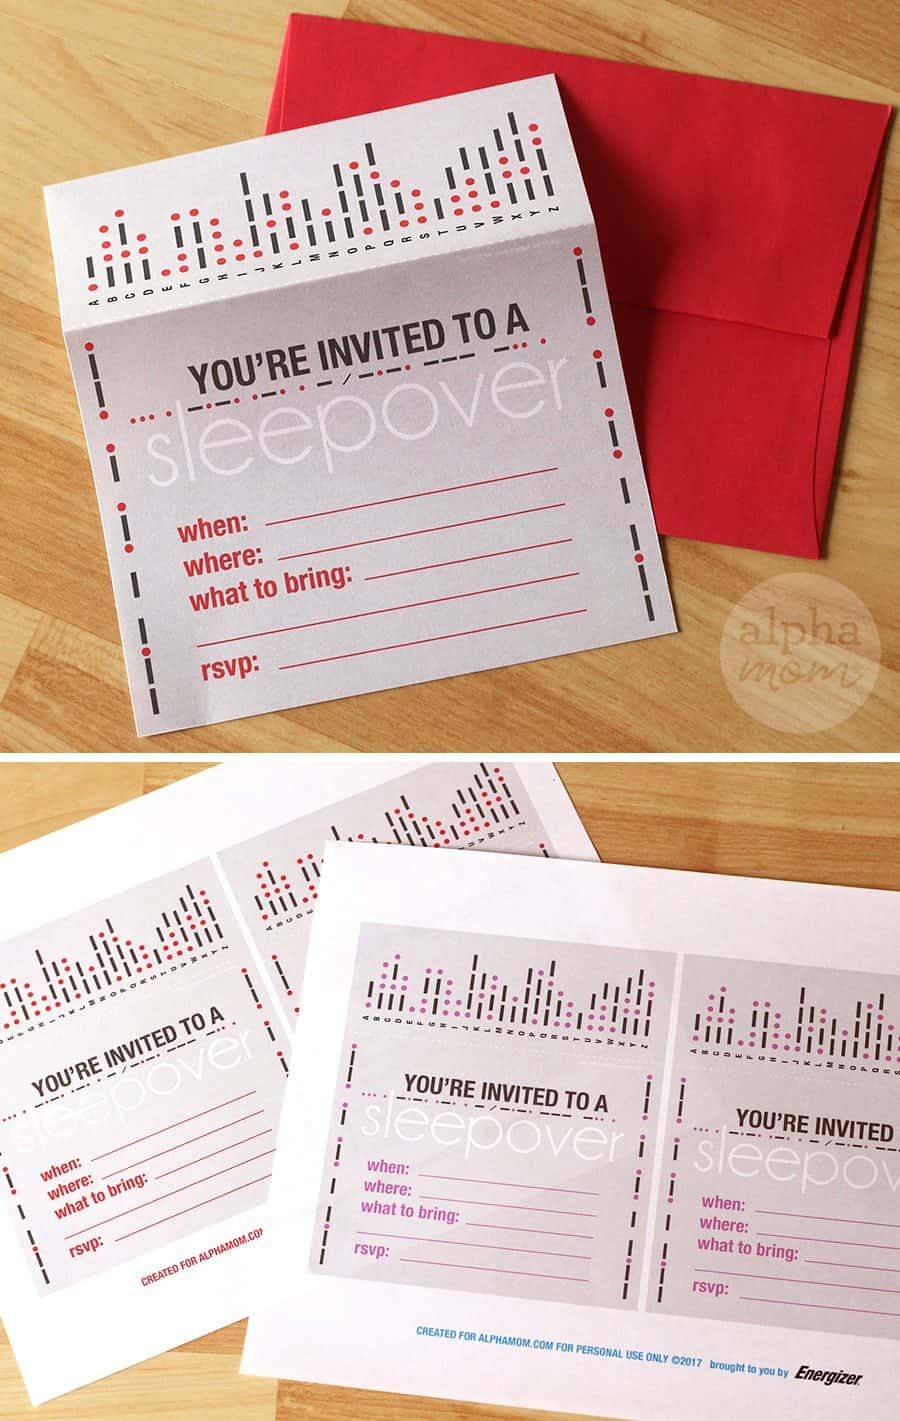 Morse Code Sleepover (invitations) by Brenda Ponnay for Alphamom.com